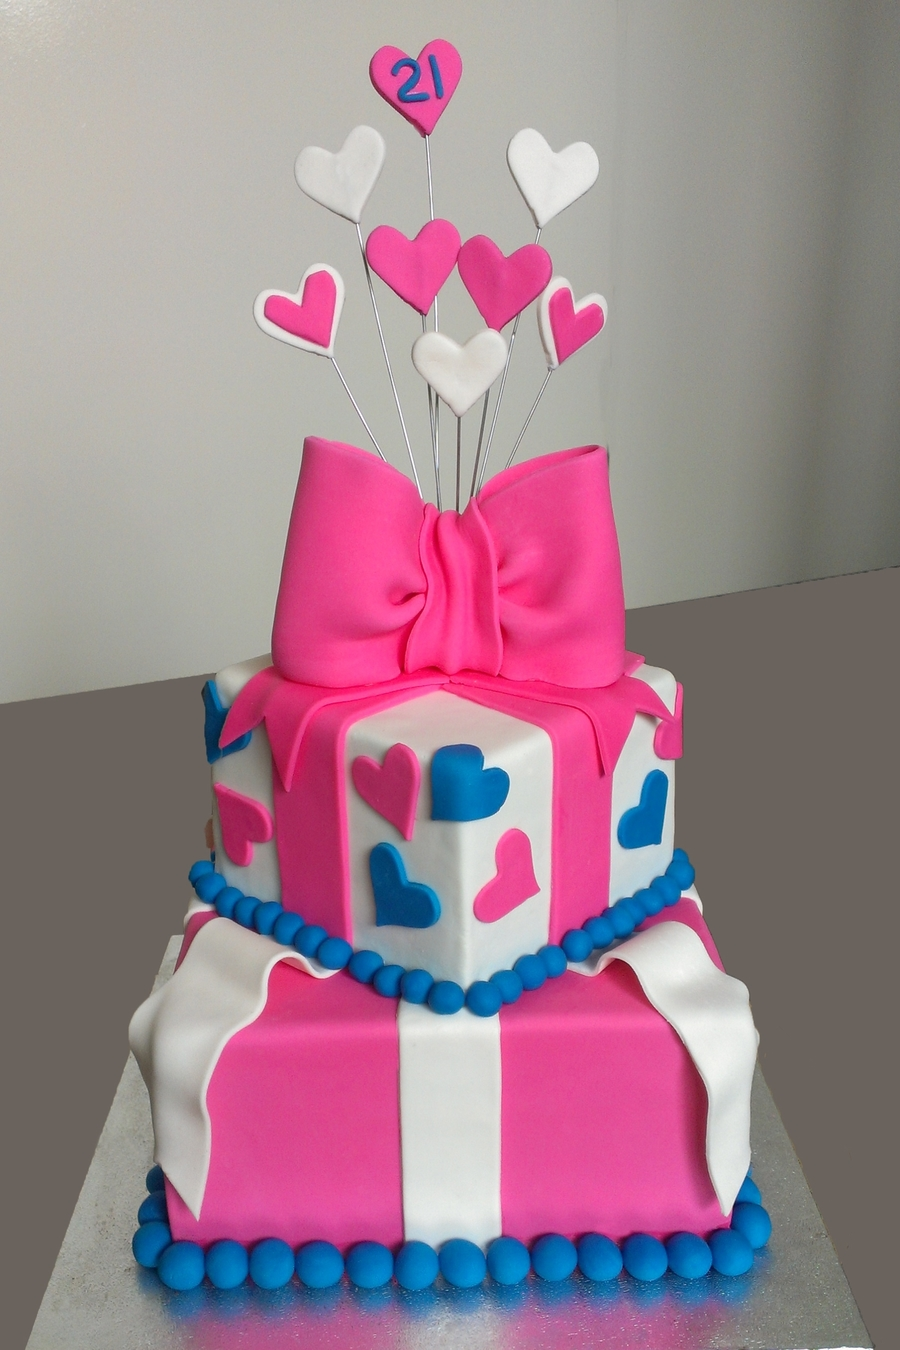 Pink Amp Blue 21st Birthday Cake Cakecentral Com